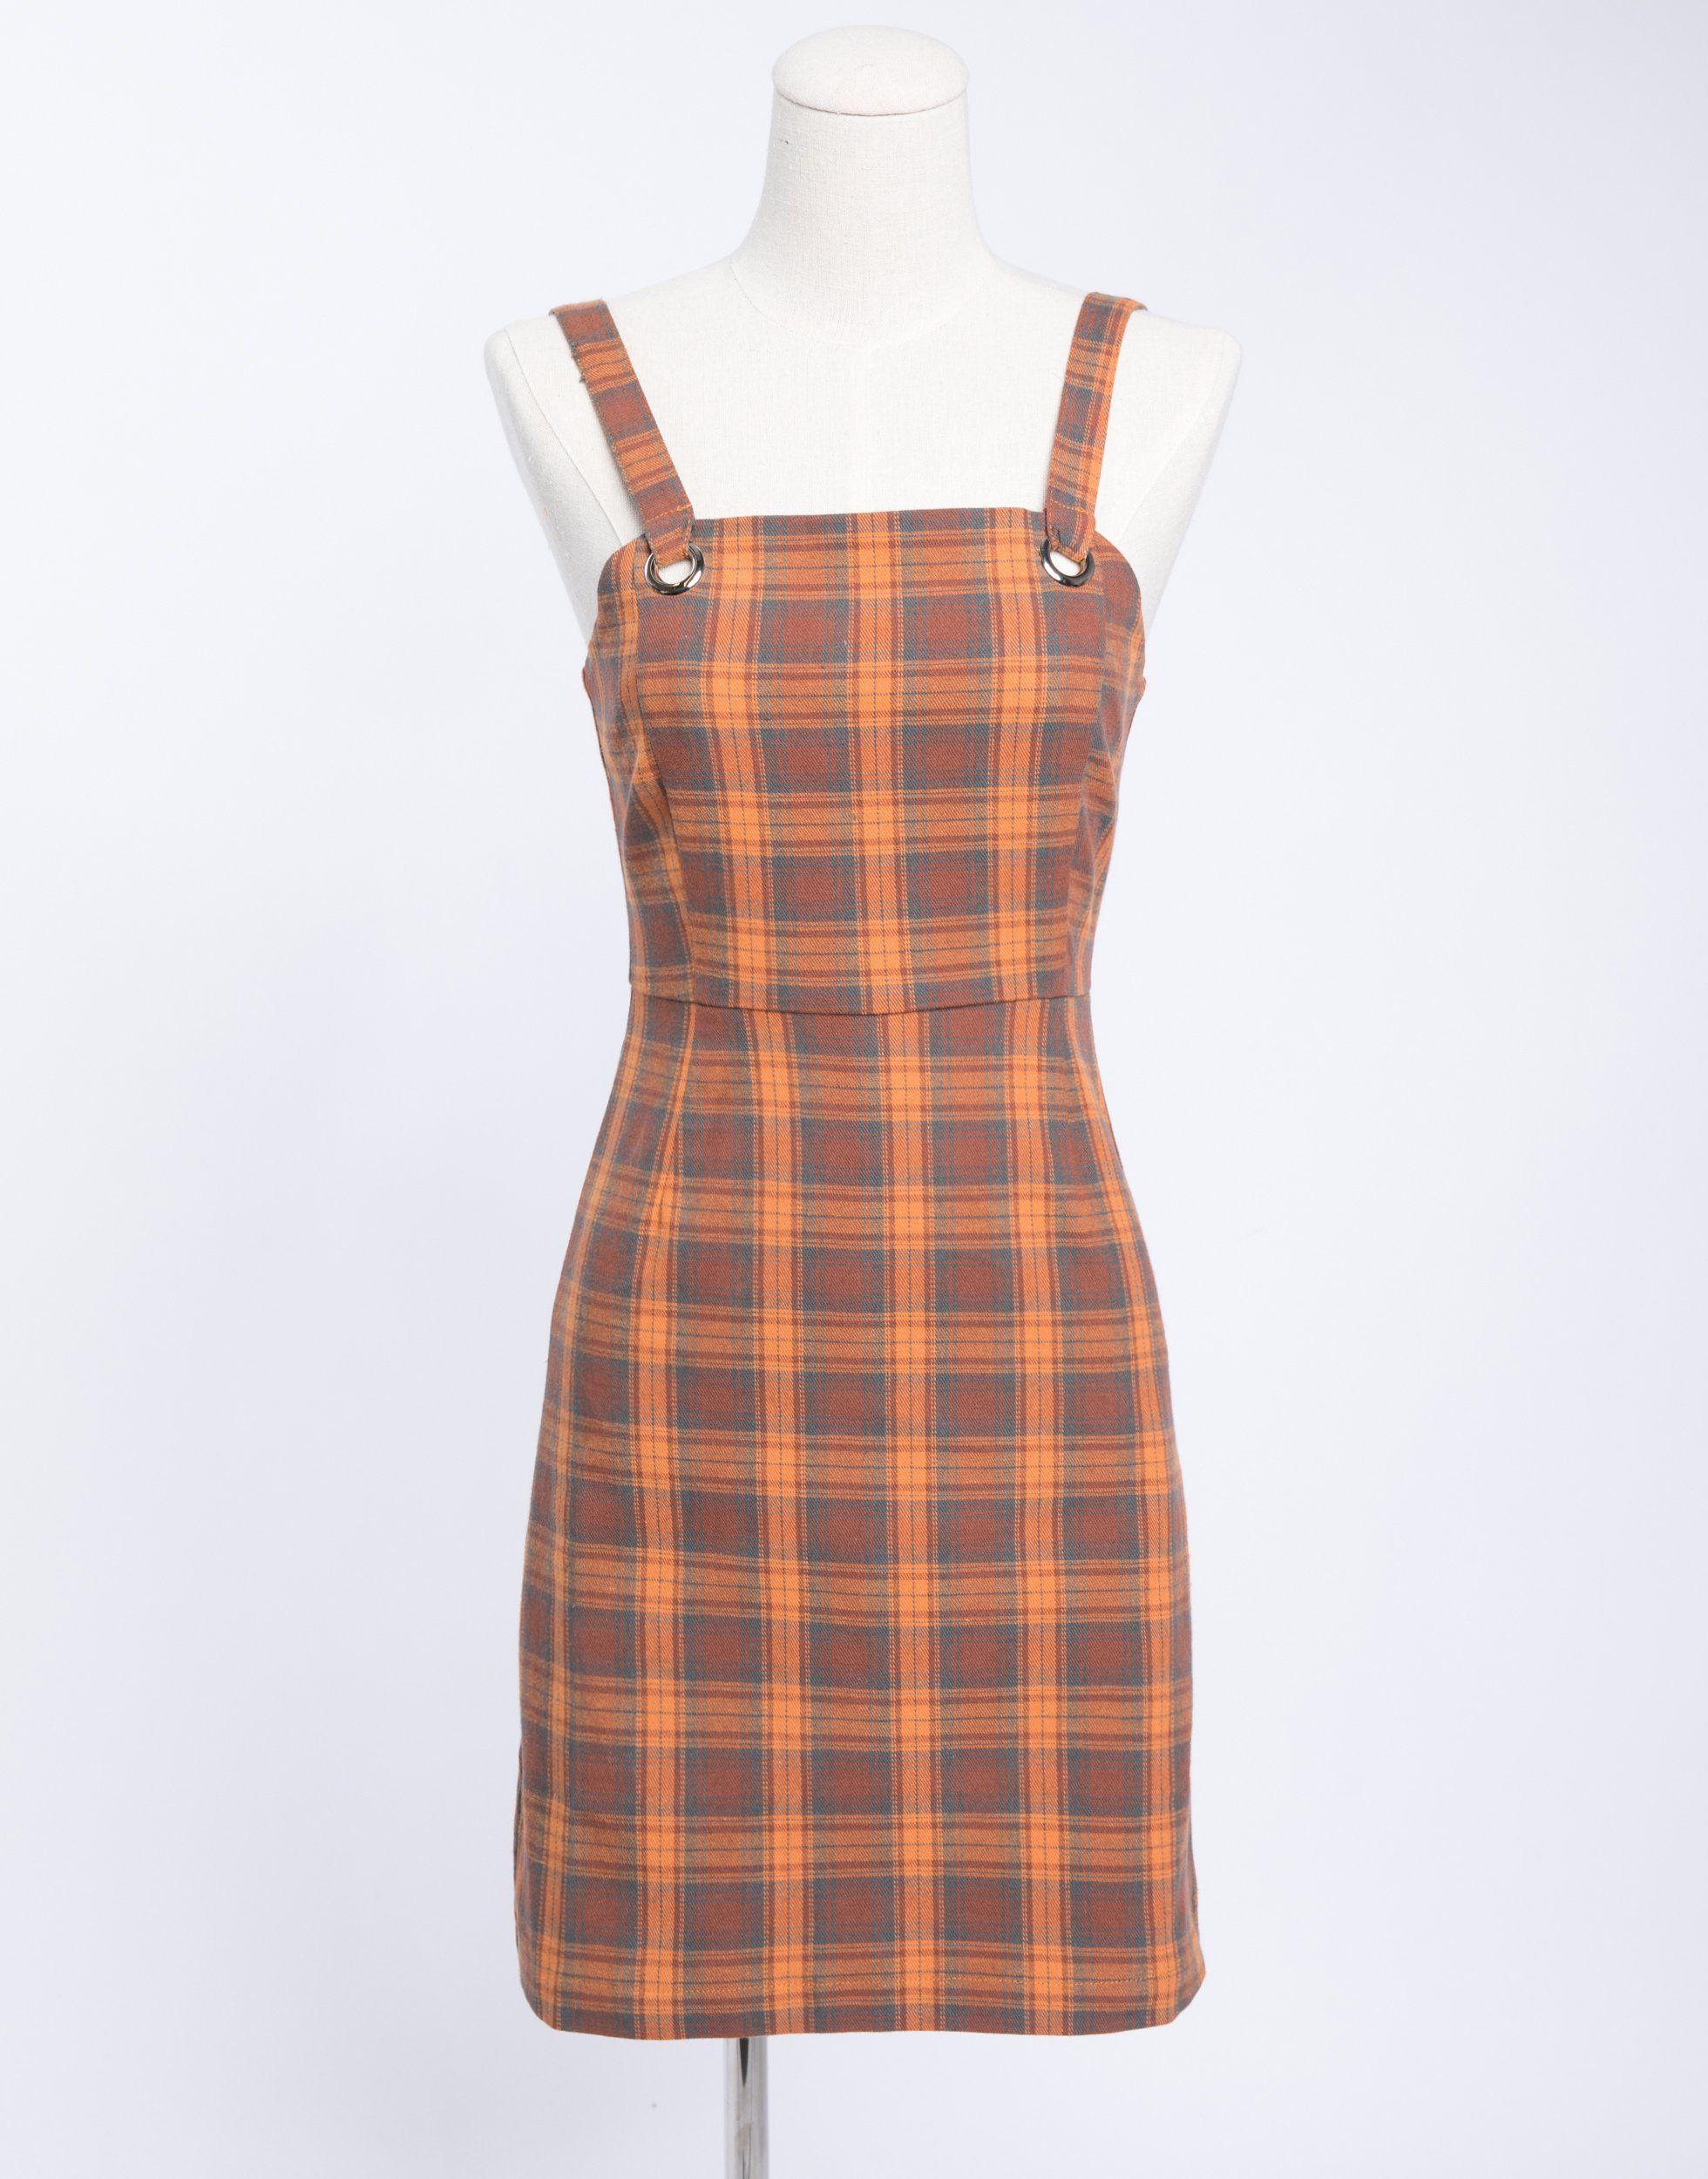 d2cac61ede Plaid Overall Dress, overall dress, spring dress, summer dress, plaid dress.